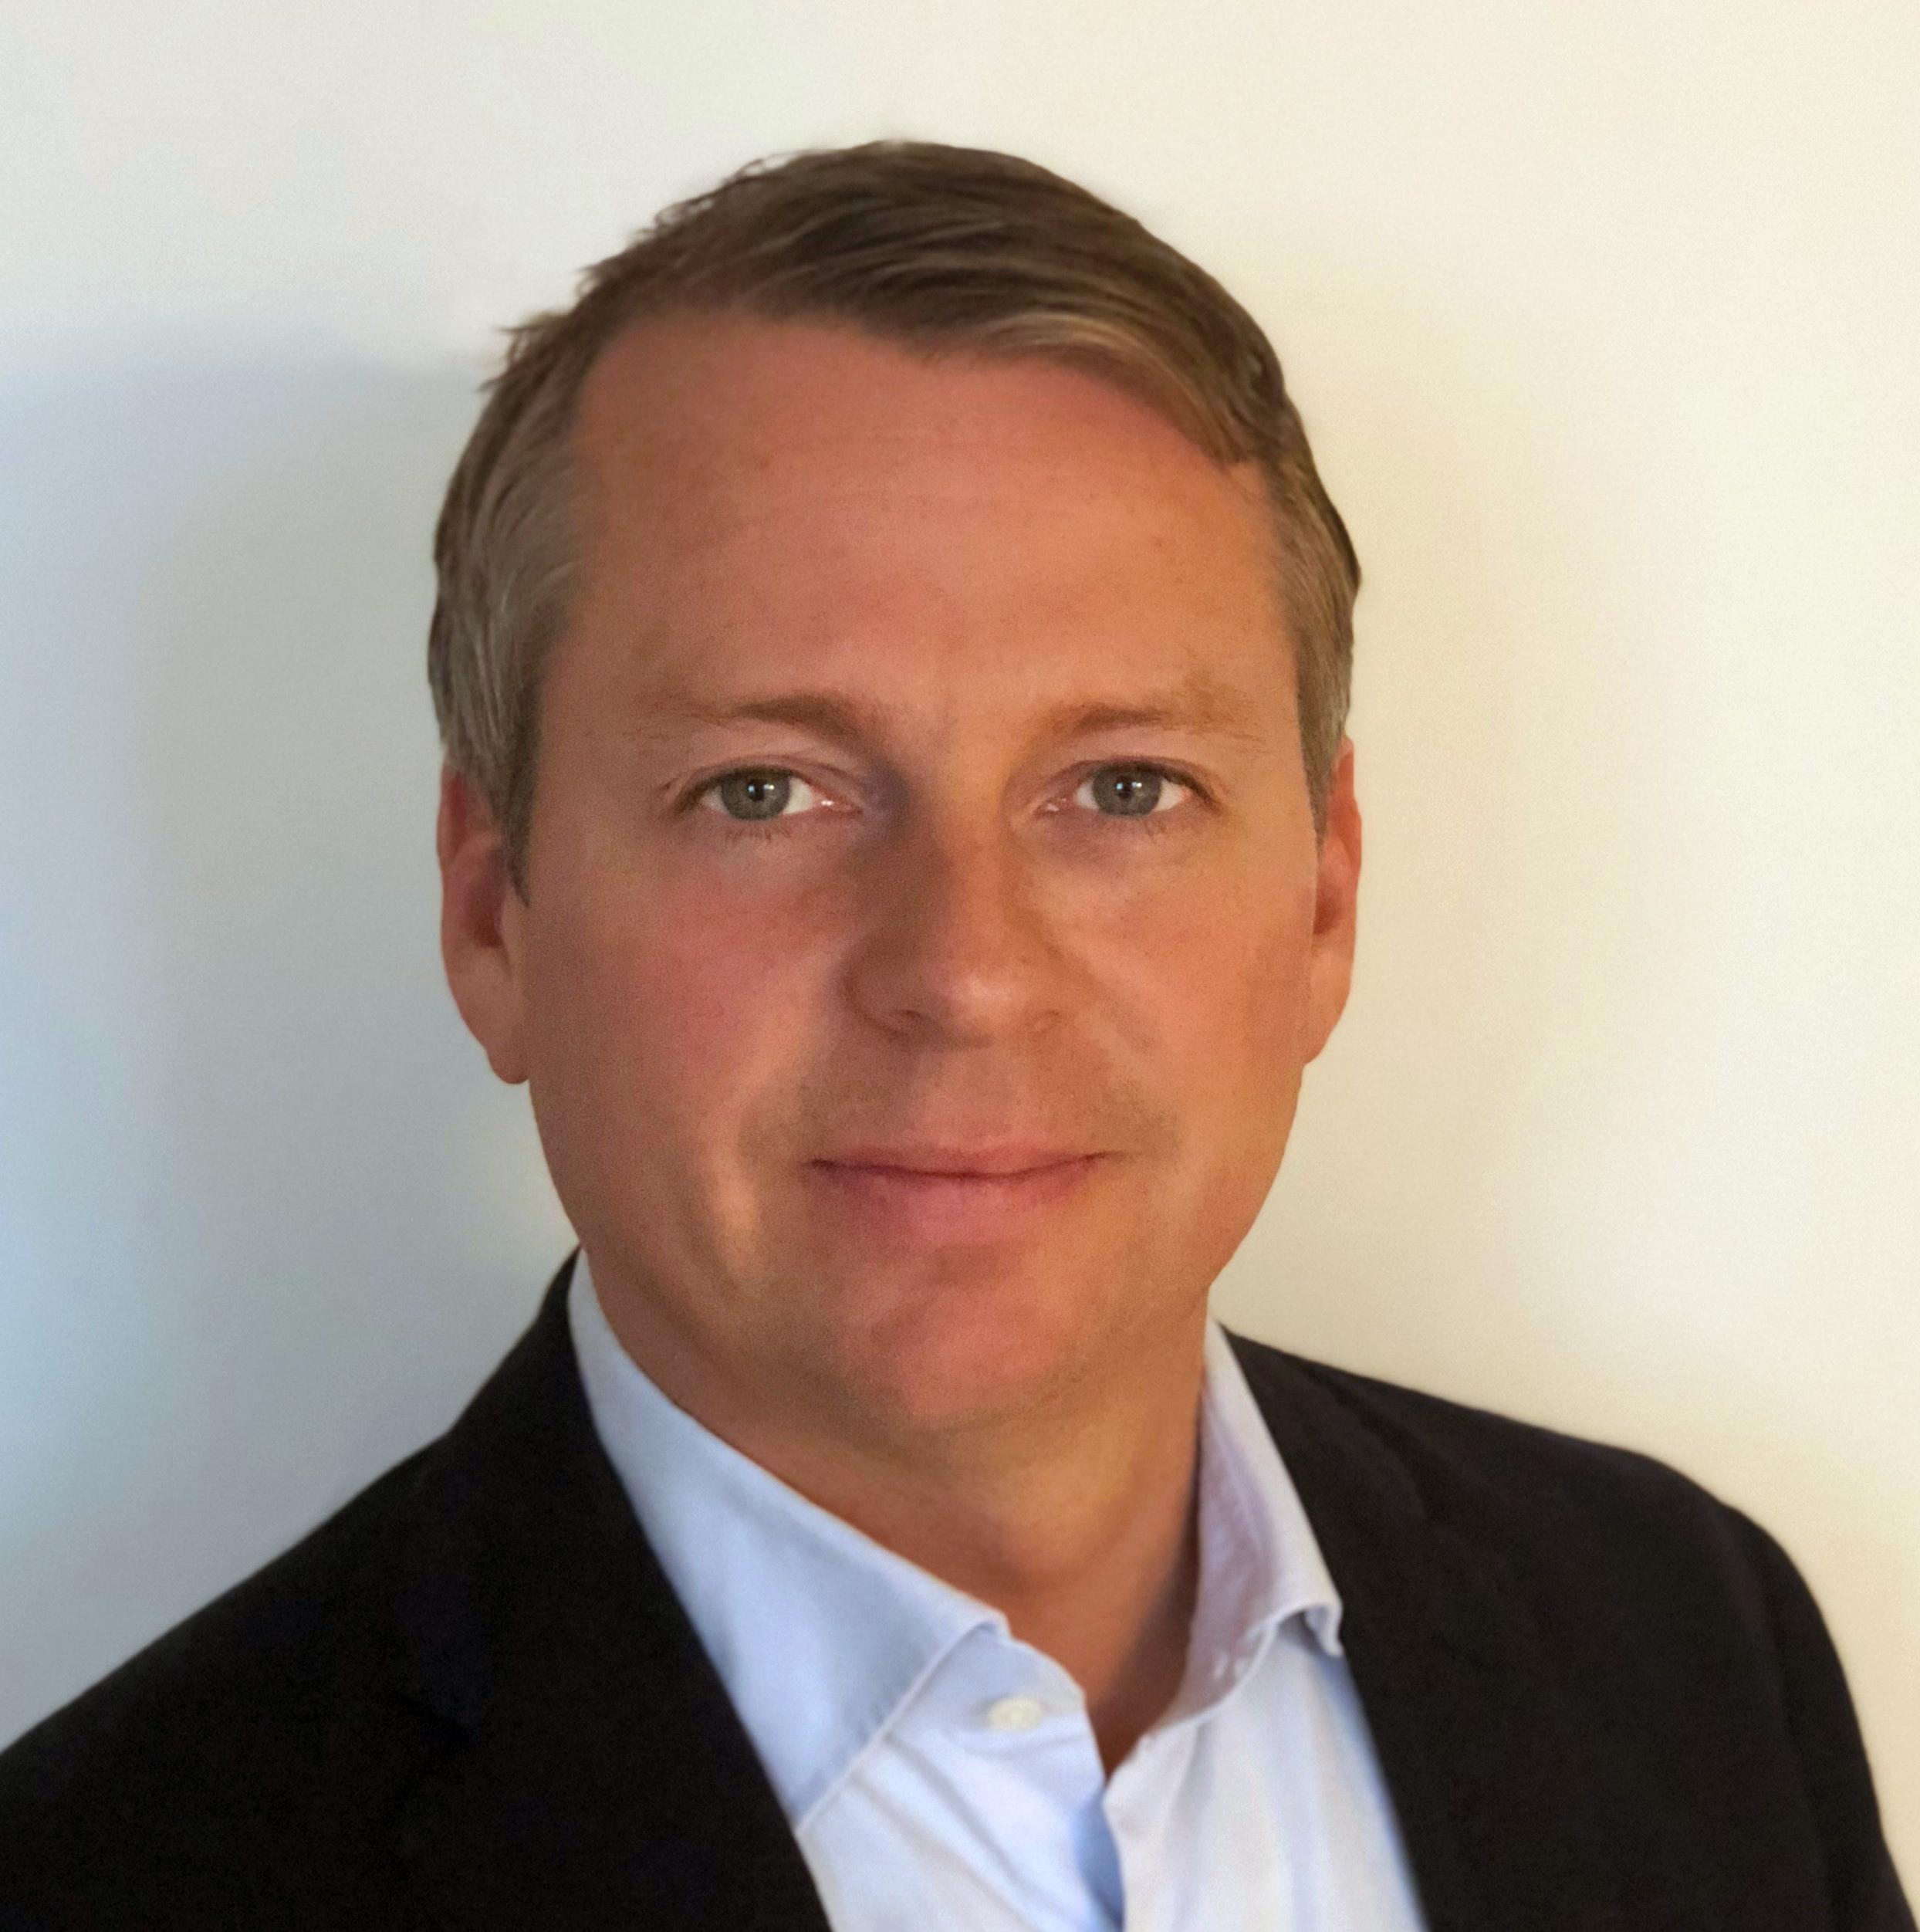 45-årige Bjarni Birkir Hardarson, som det seneste år har været chef for Icelandair i Skandinavien og Finland, er nu chef for hele flyselskabet i Europa – minus Island. Pressefoto: Icelandair.